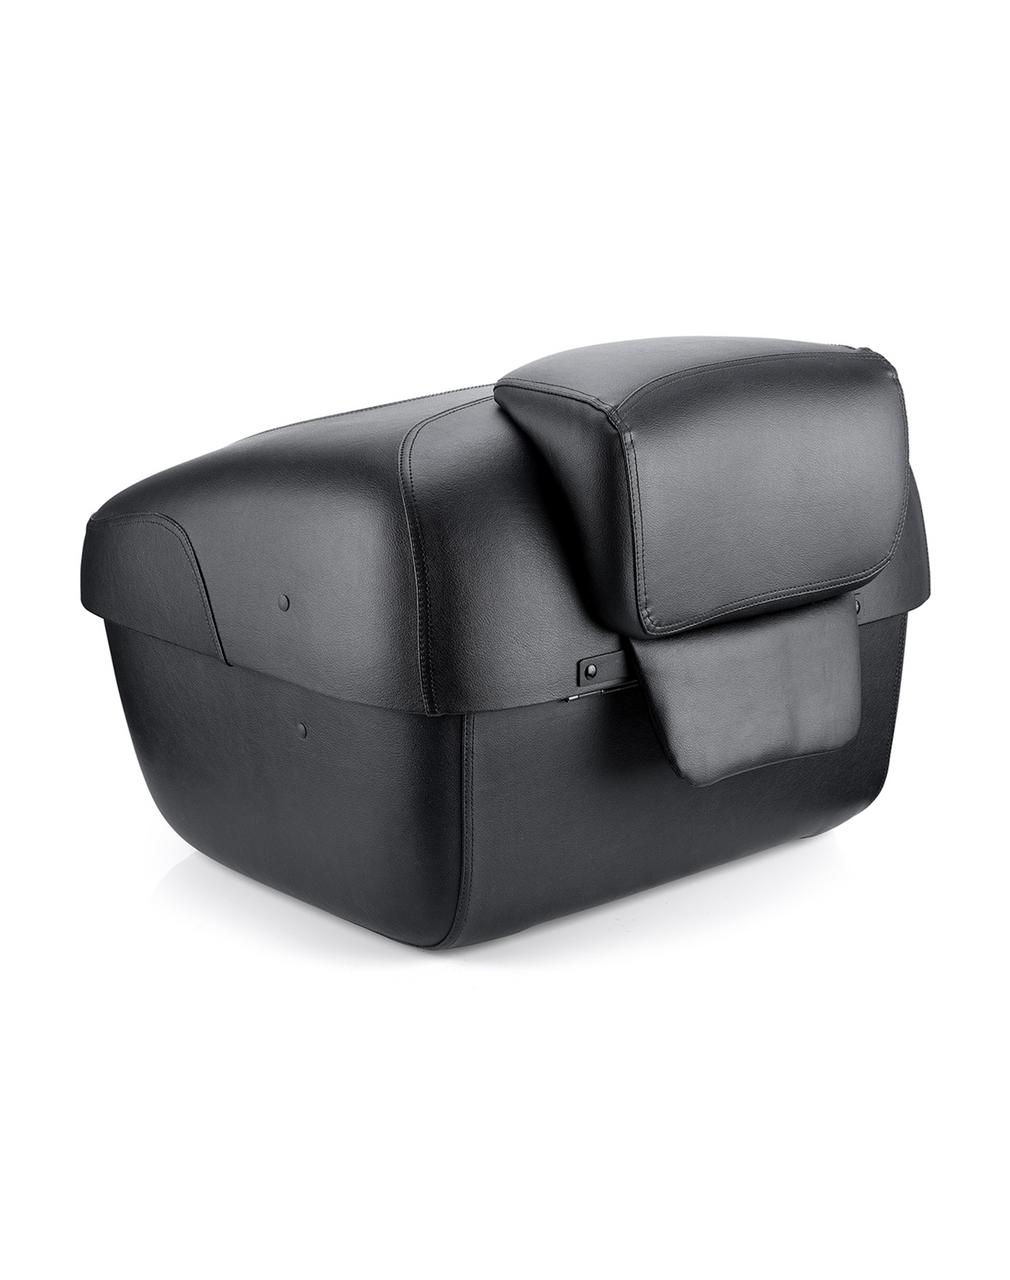 Suzuki Viking Premium Leather Wrapped Hard Trunk Back View